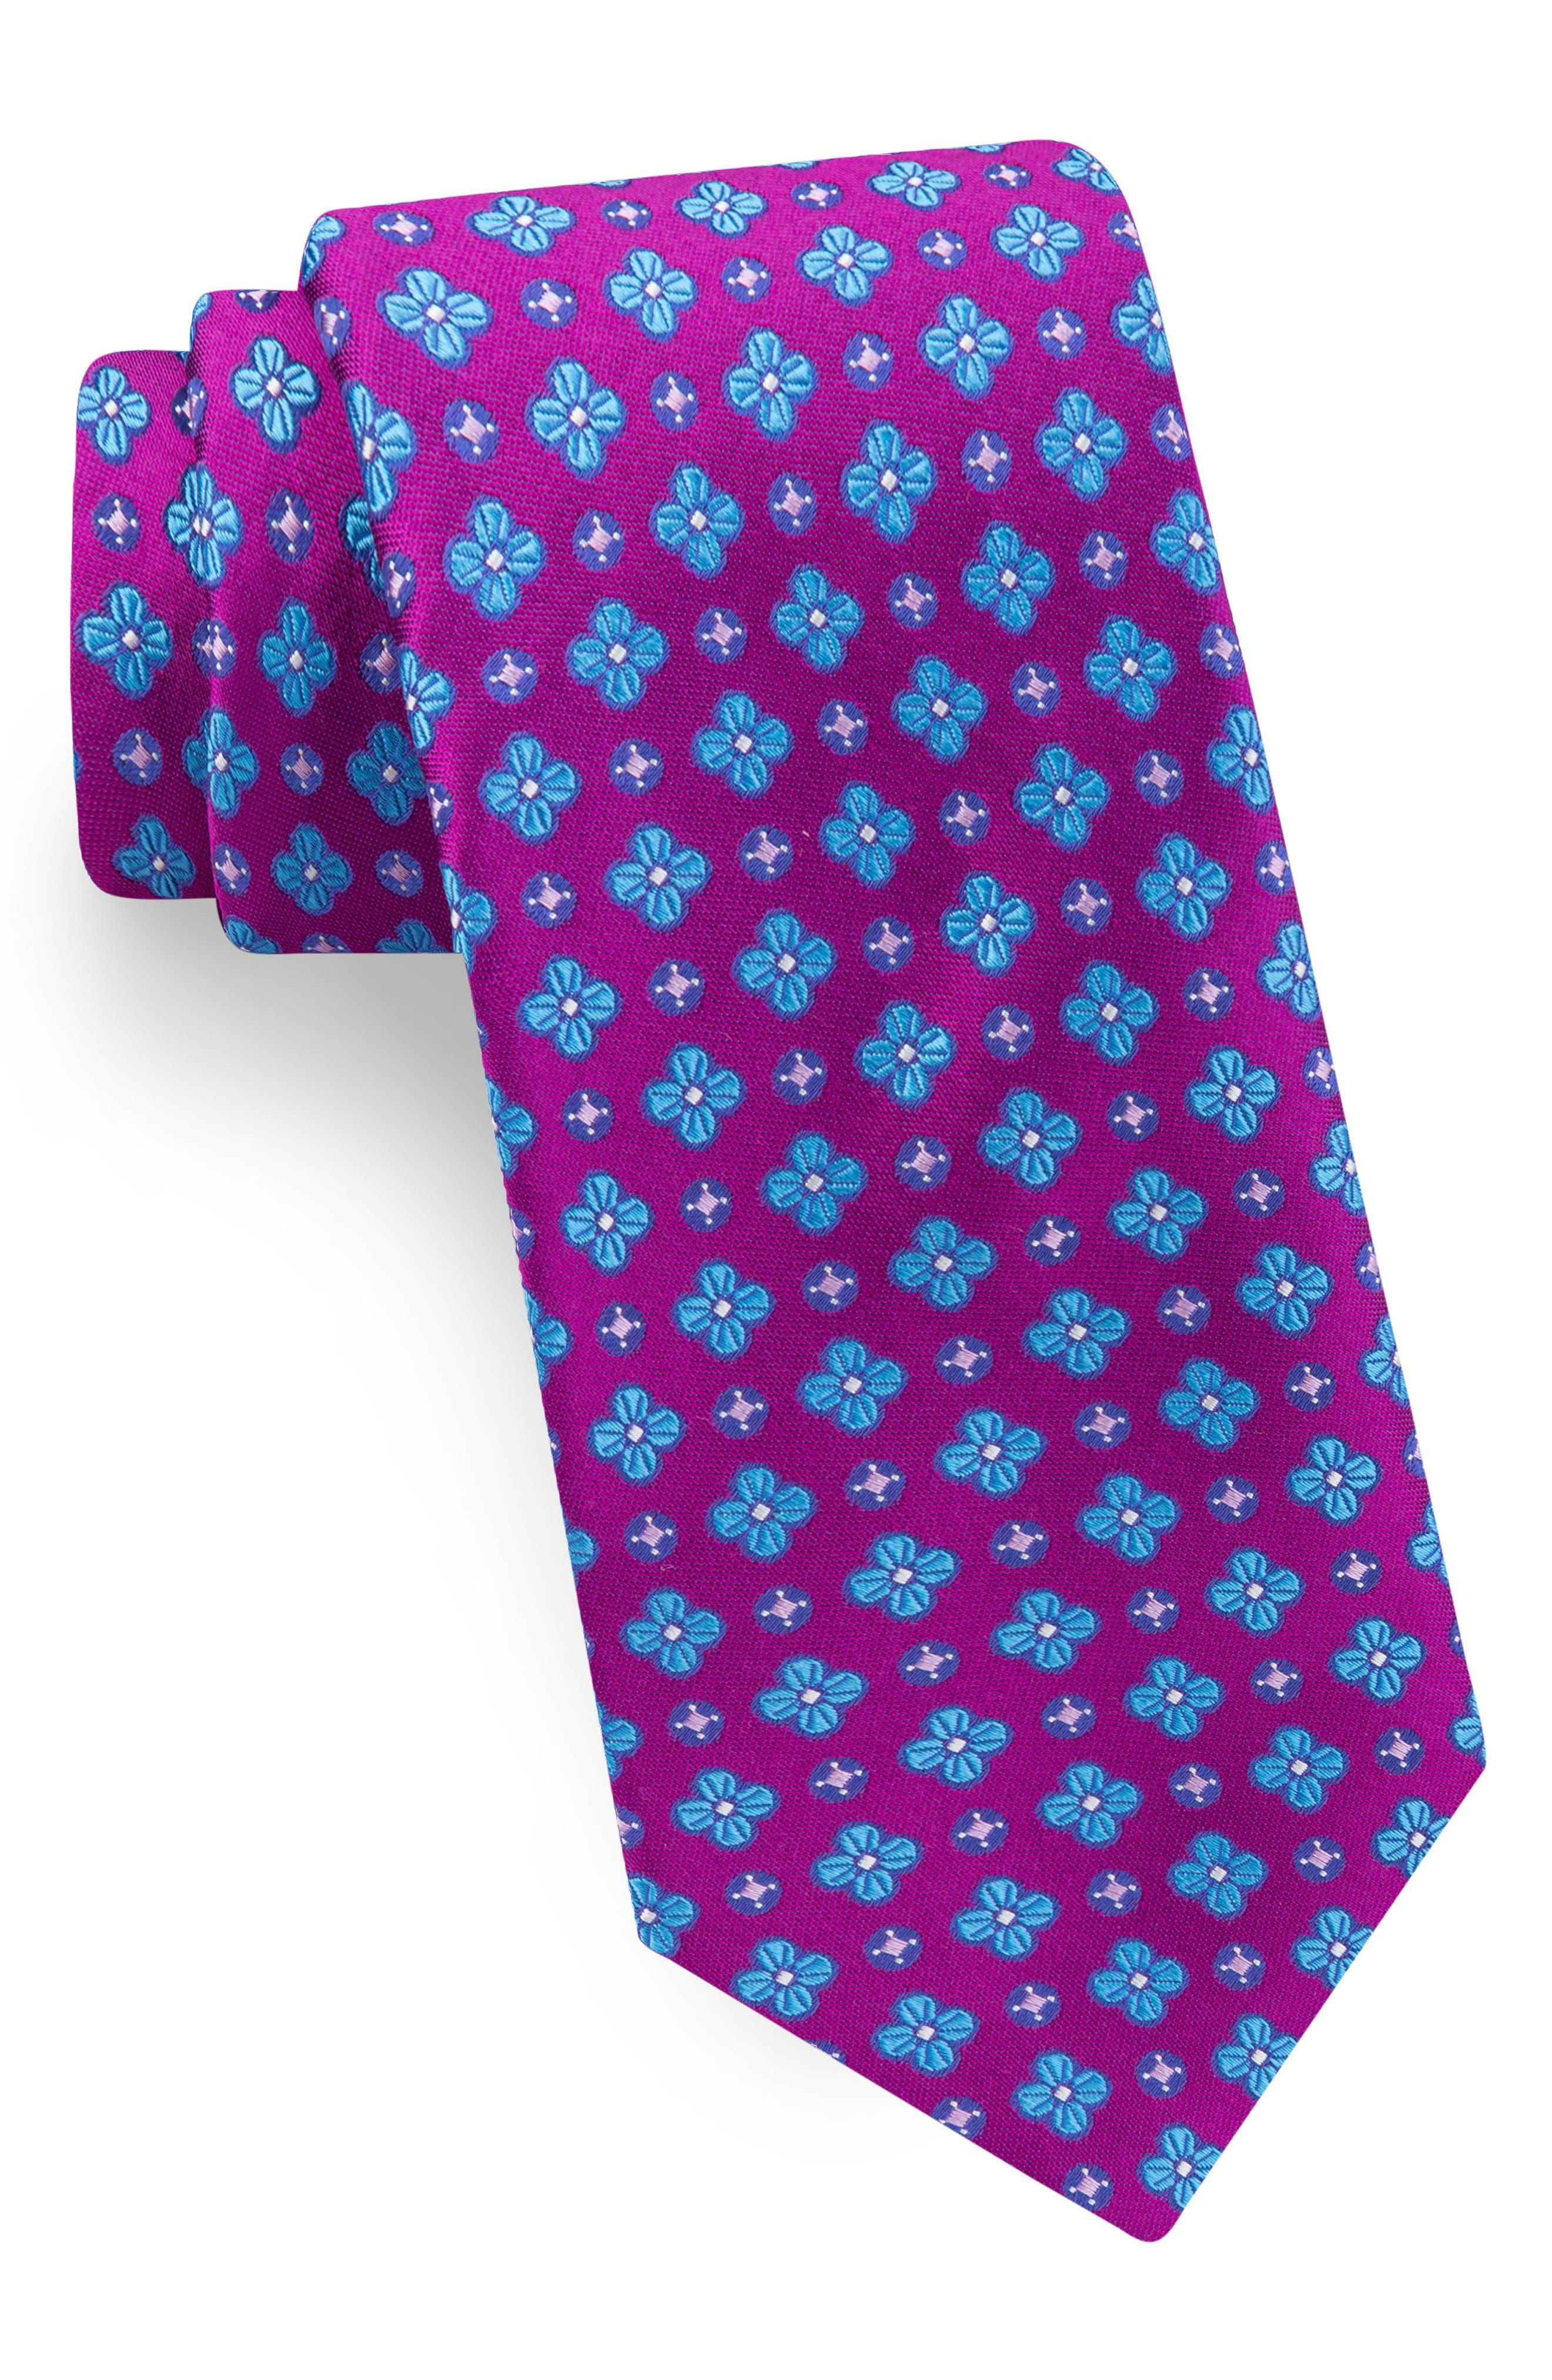 Lansbury Floral Silk Tie,                         Main,                         color, Fuchsia